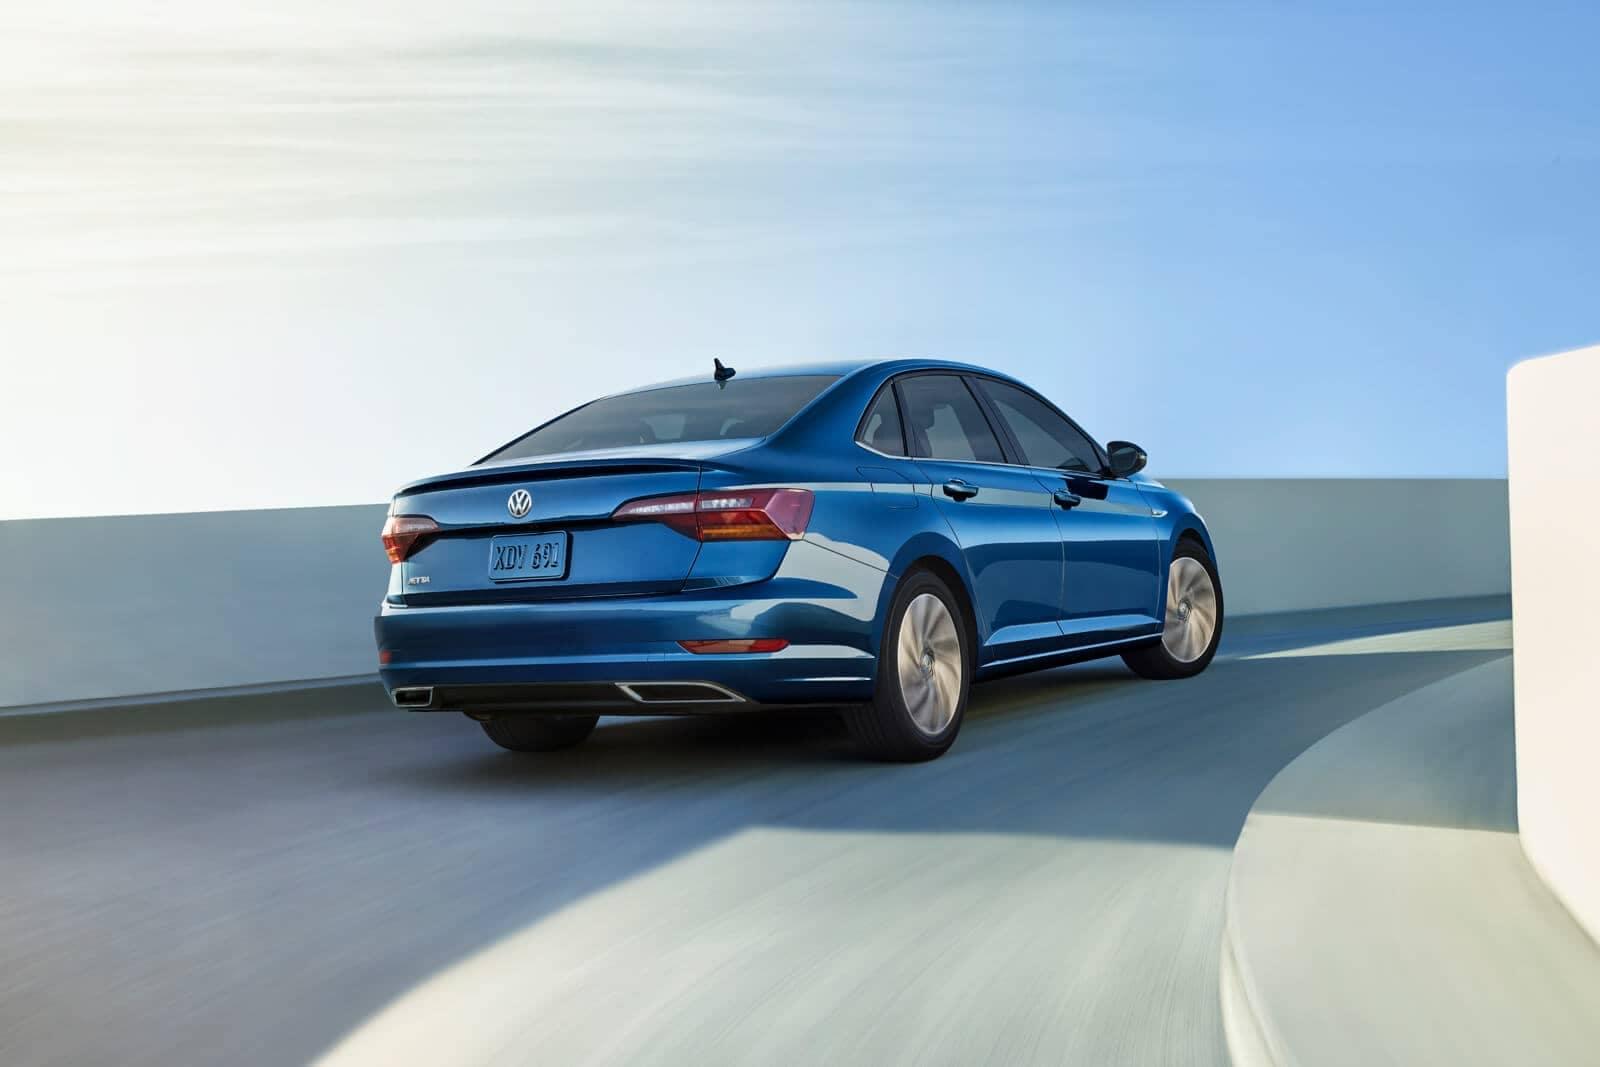 2019 Volkswagen Jetta Rear